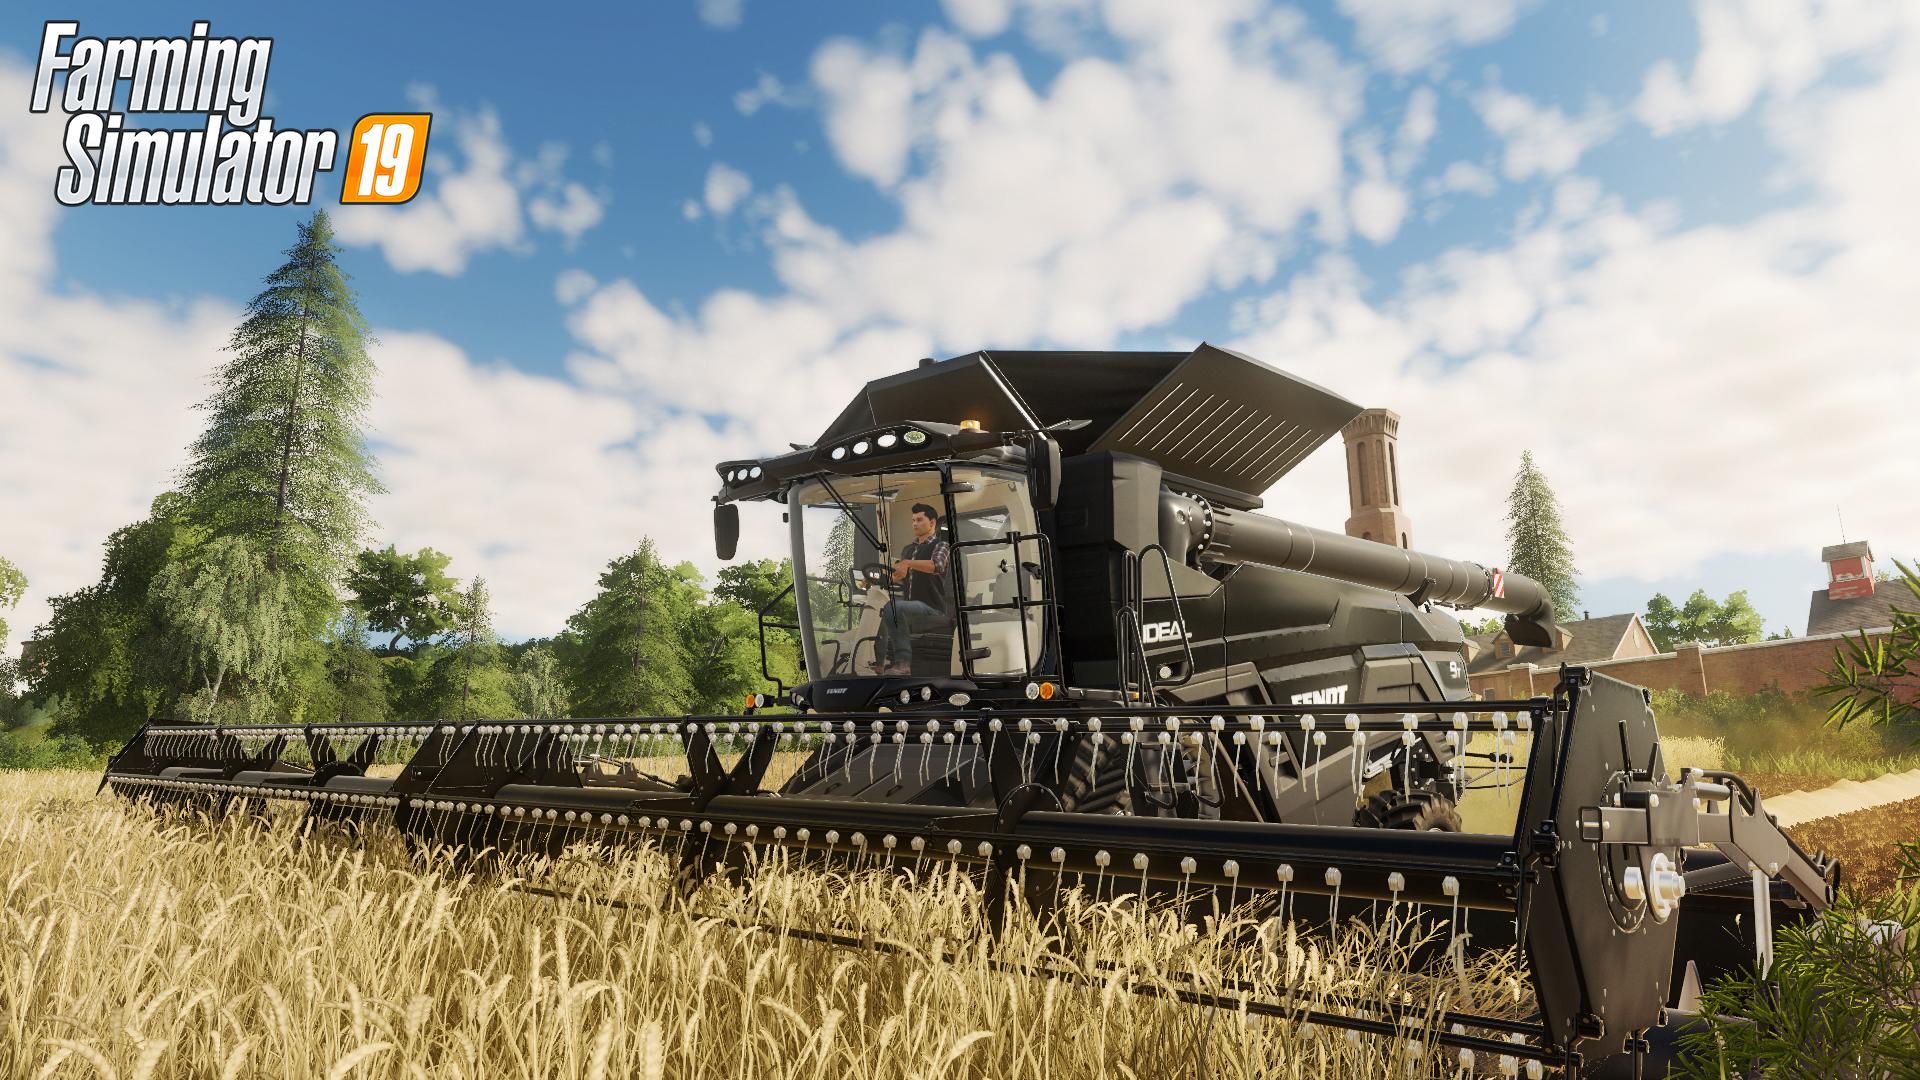 Farming Simulator 19 video trailer